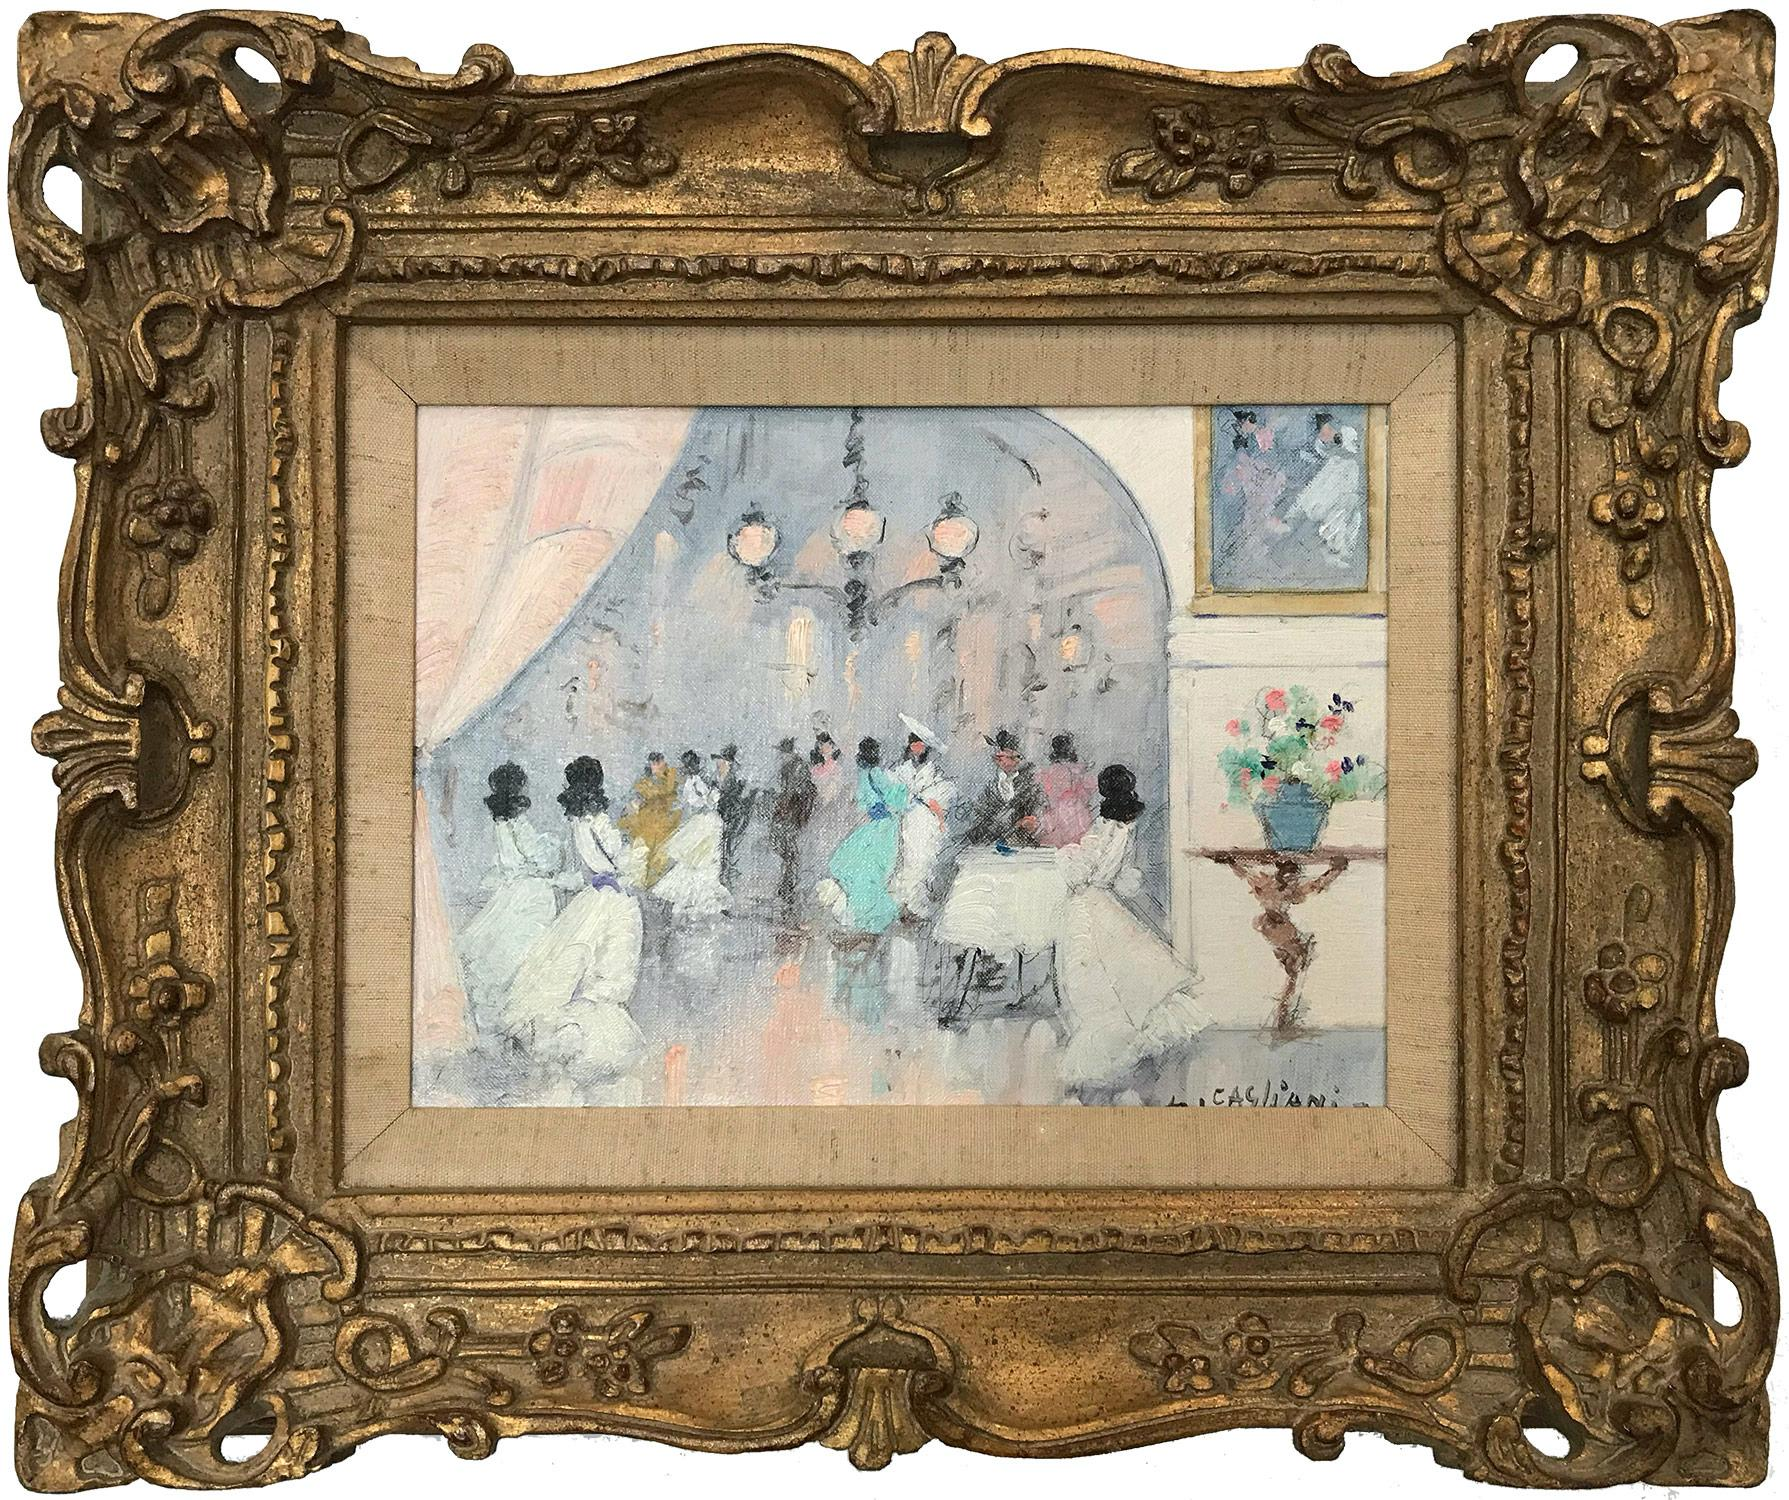 """Parisian Ballroom Scene with Figures"" Impressionist Oil Painting on Canvas"